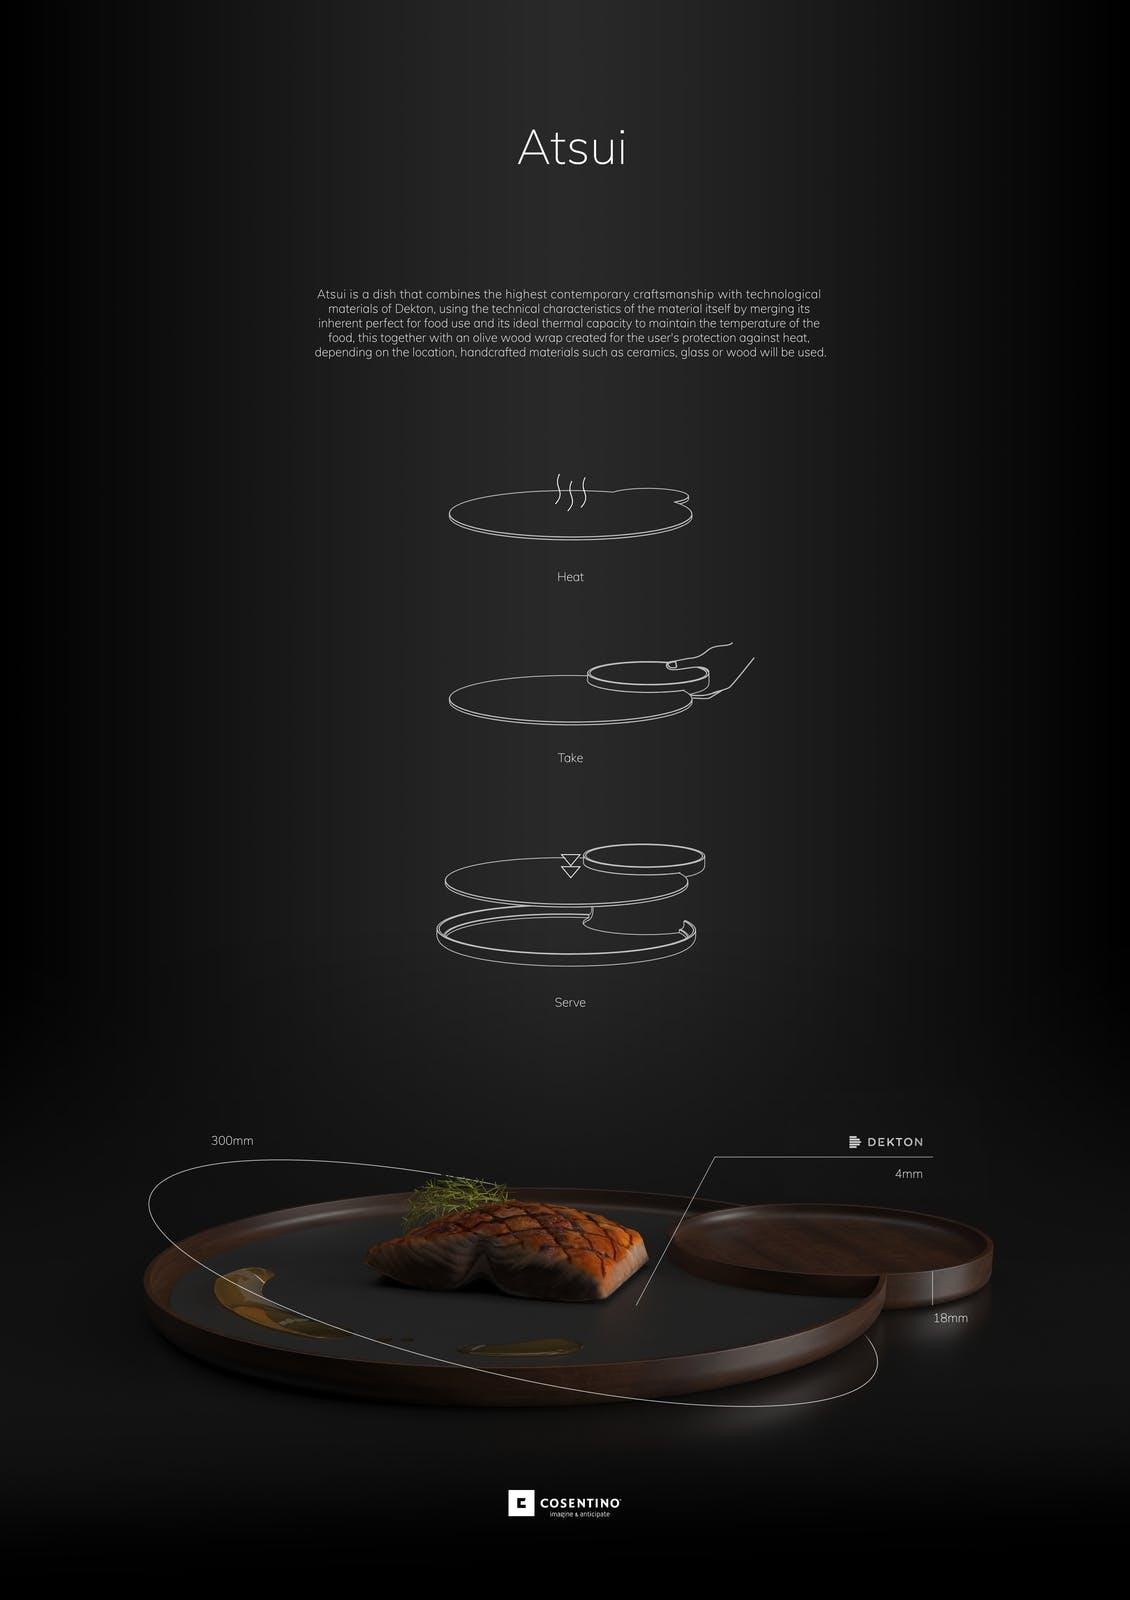 Image of 003 Atsui s in Cosentino Design Challenge 14 winners - Cosentino